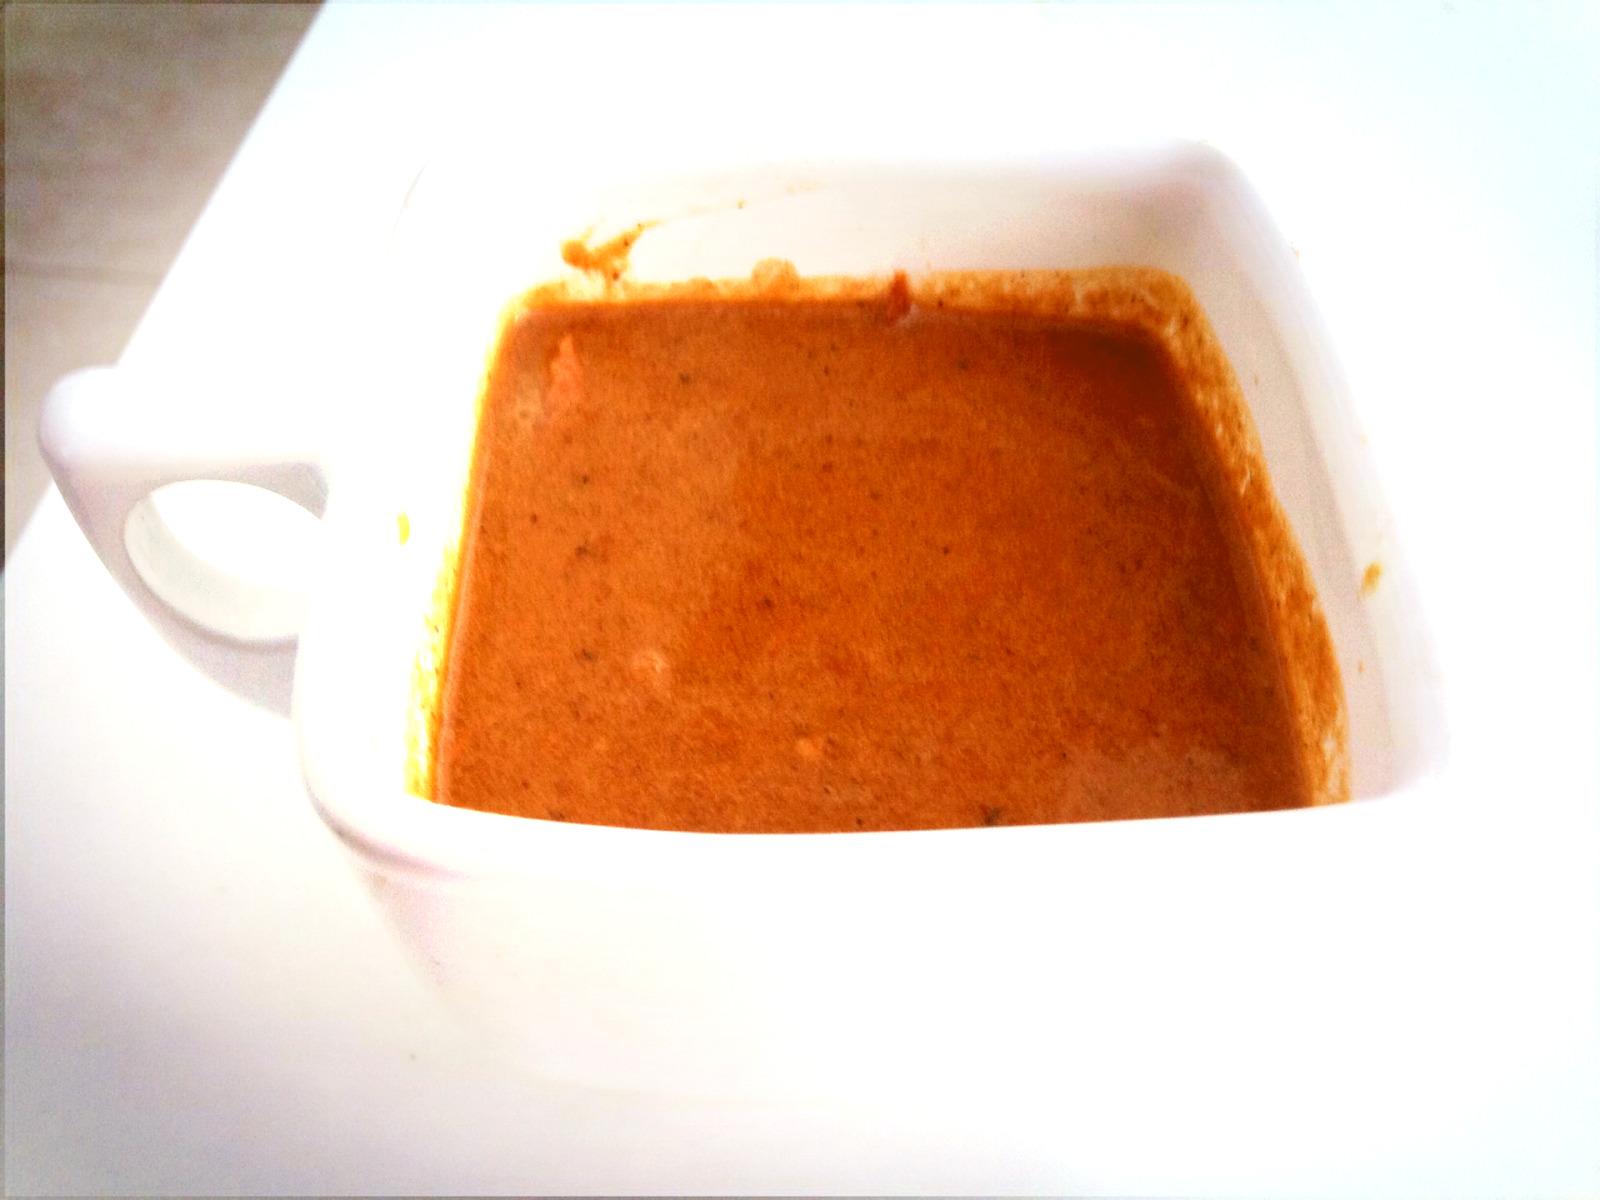 Sopa de tomate tatemado